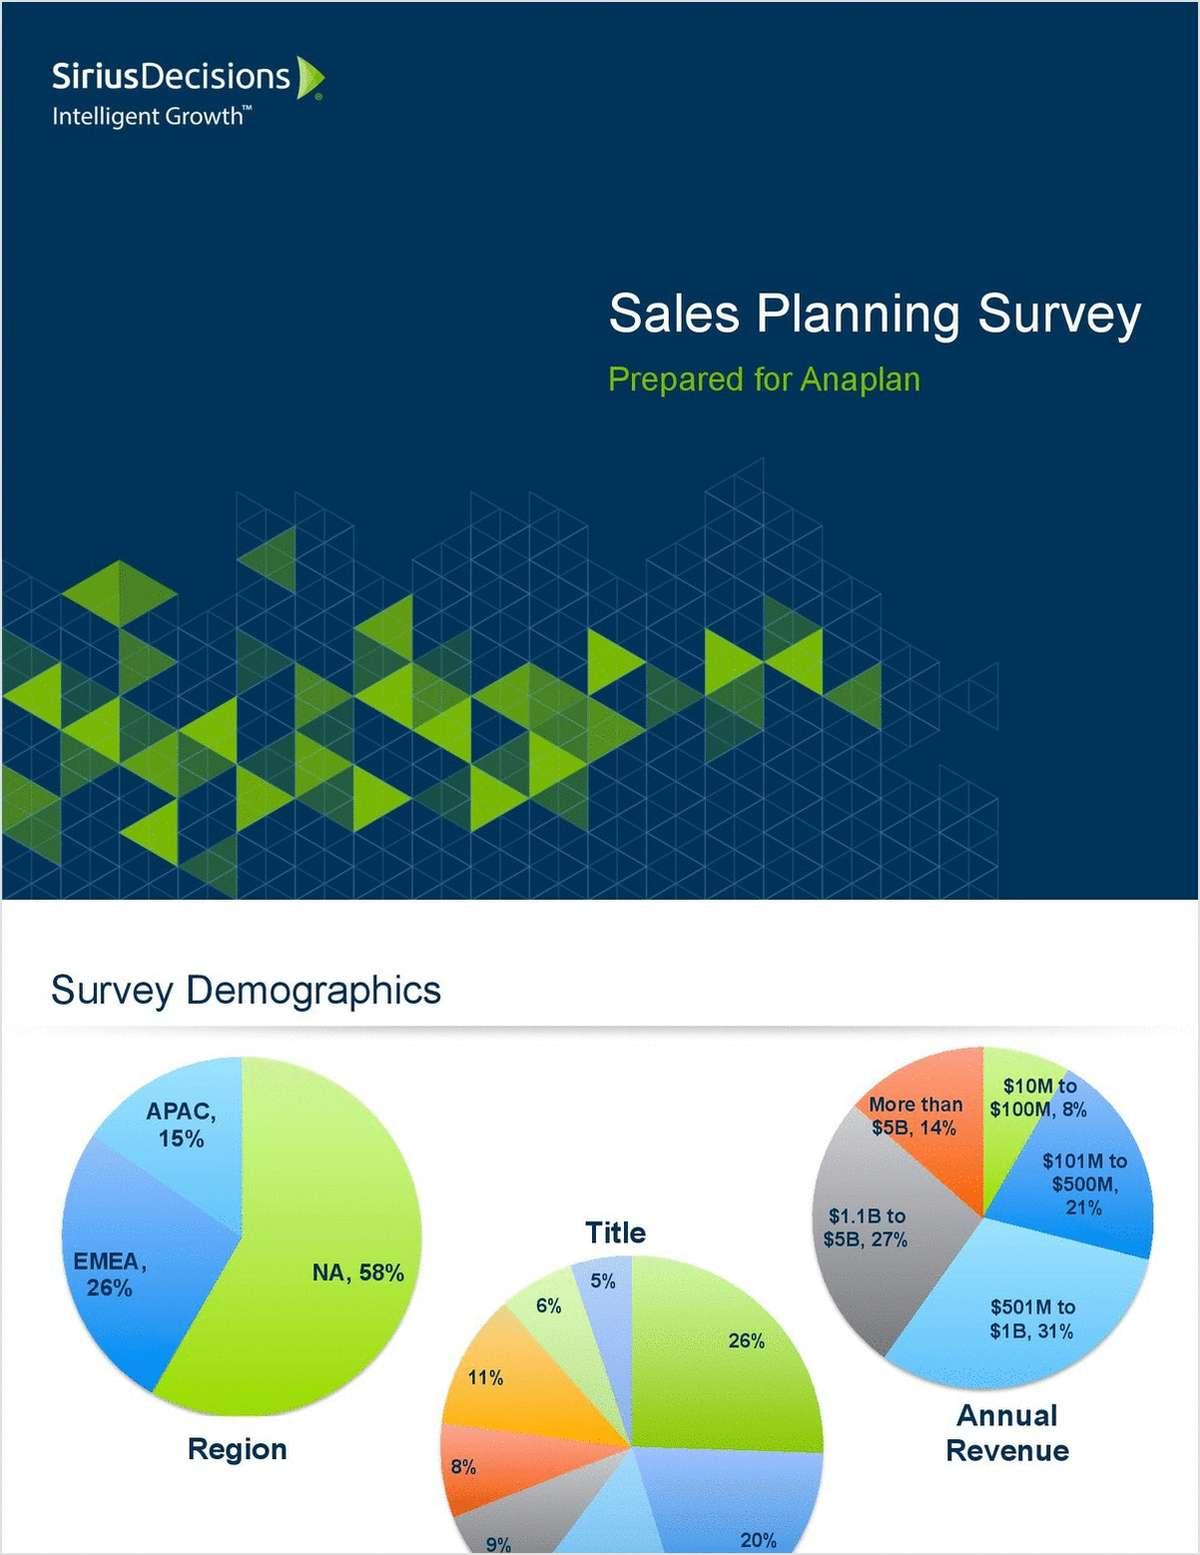 SiriusDecisions Reveals Sales Planning Missteps that Decrease